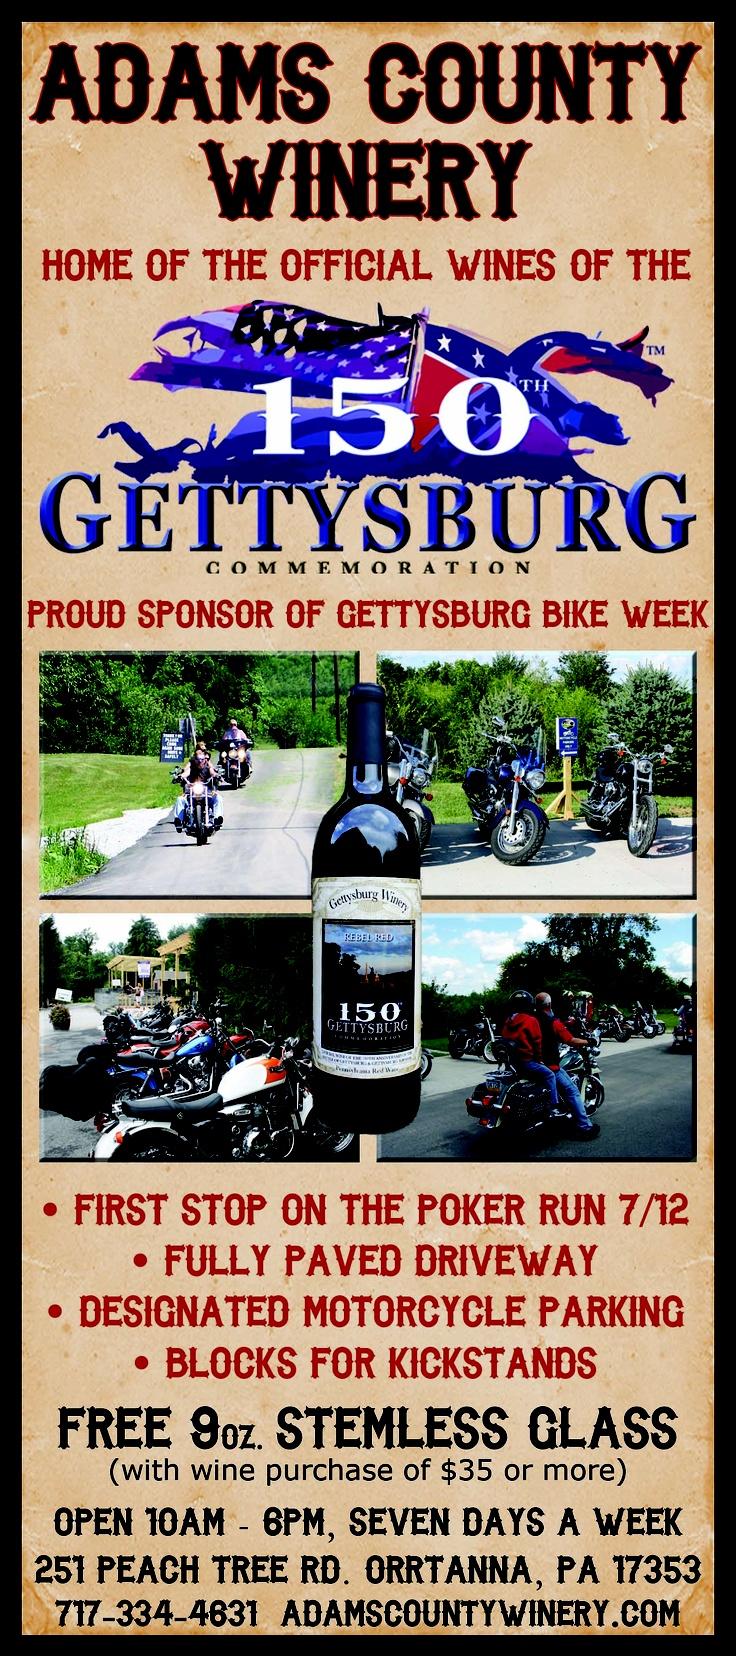 Gettysburg Bike Week ad